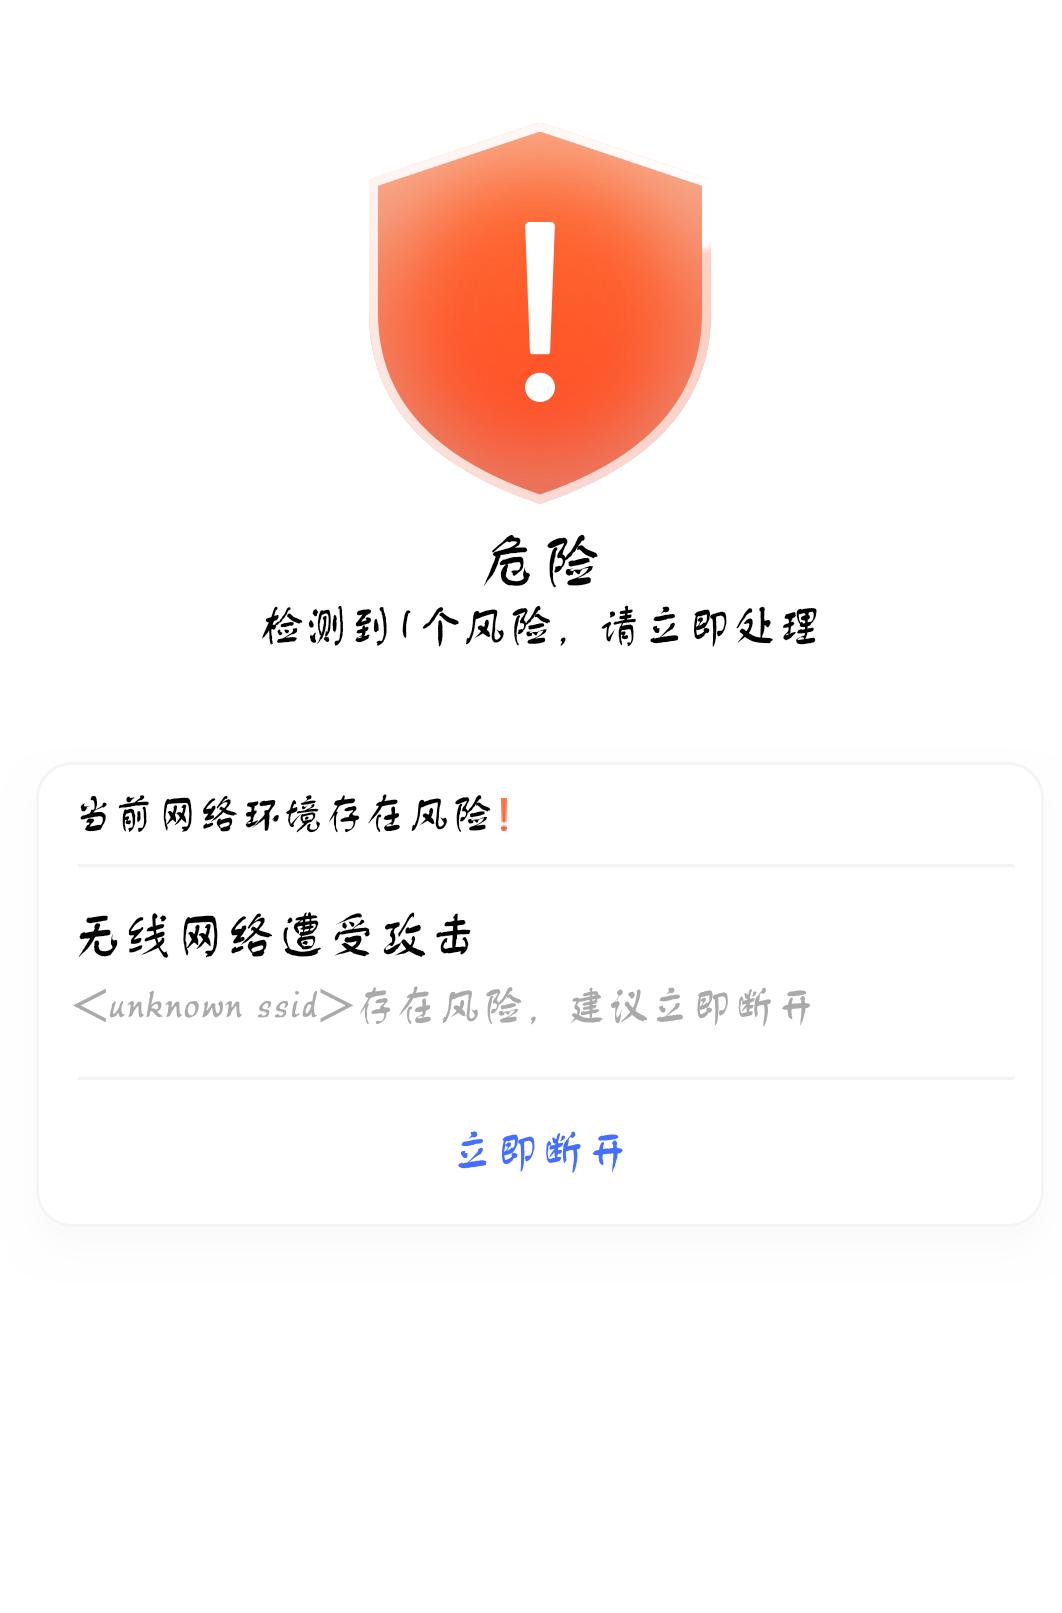 Screenshot_2019_1018_163015.png